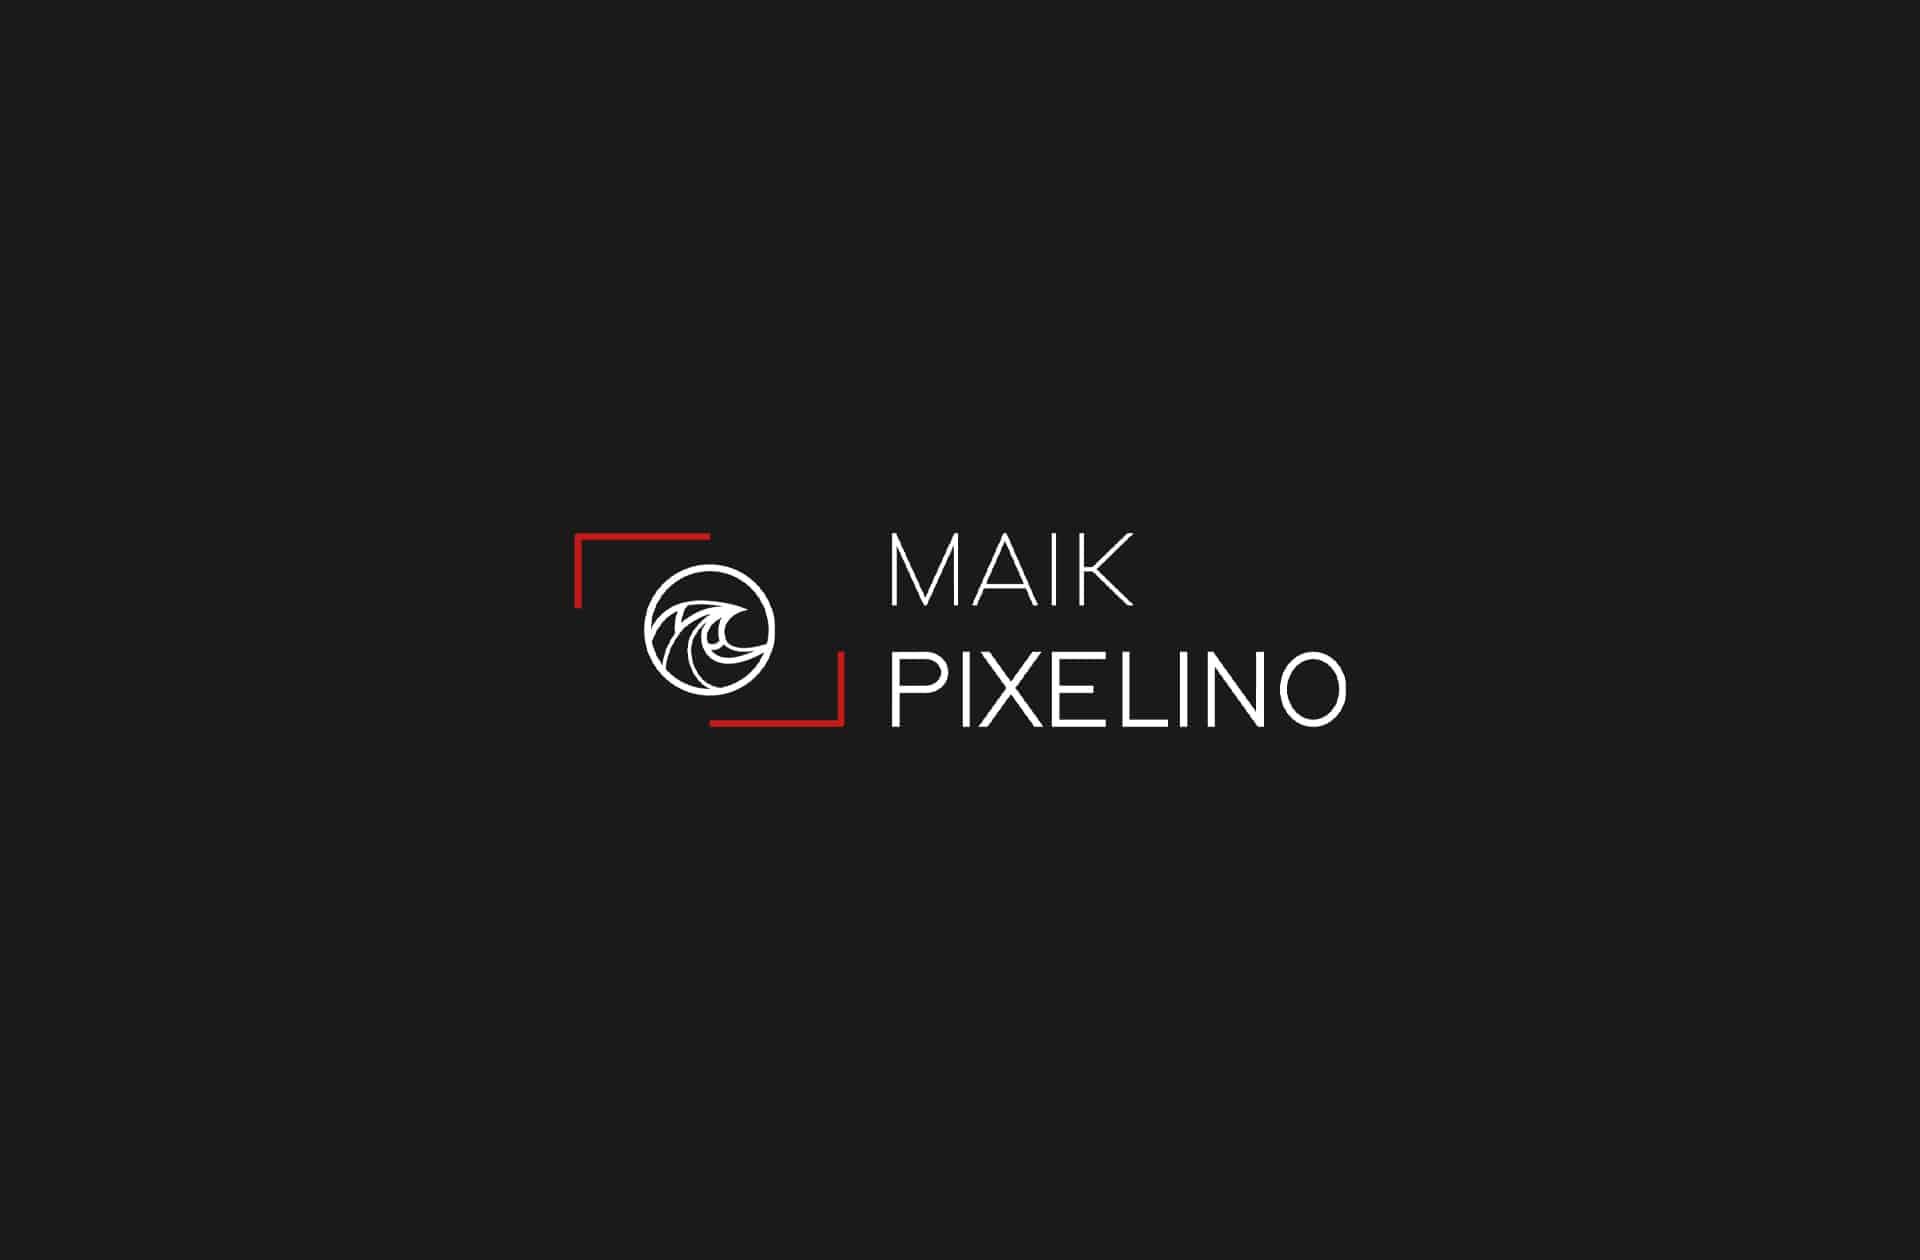 Maik Pixelino Fotograf